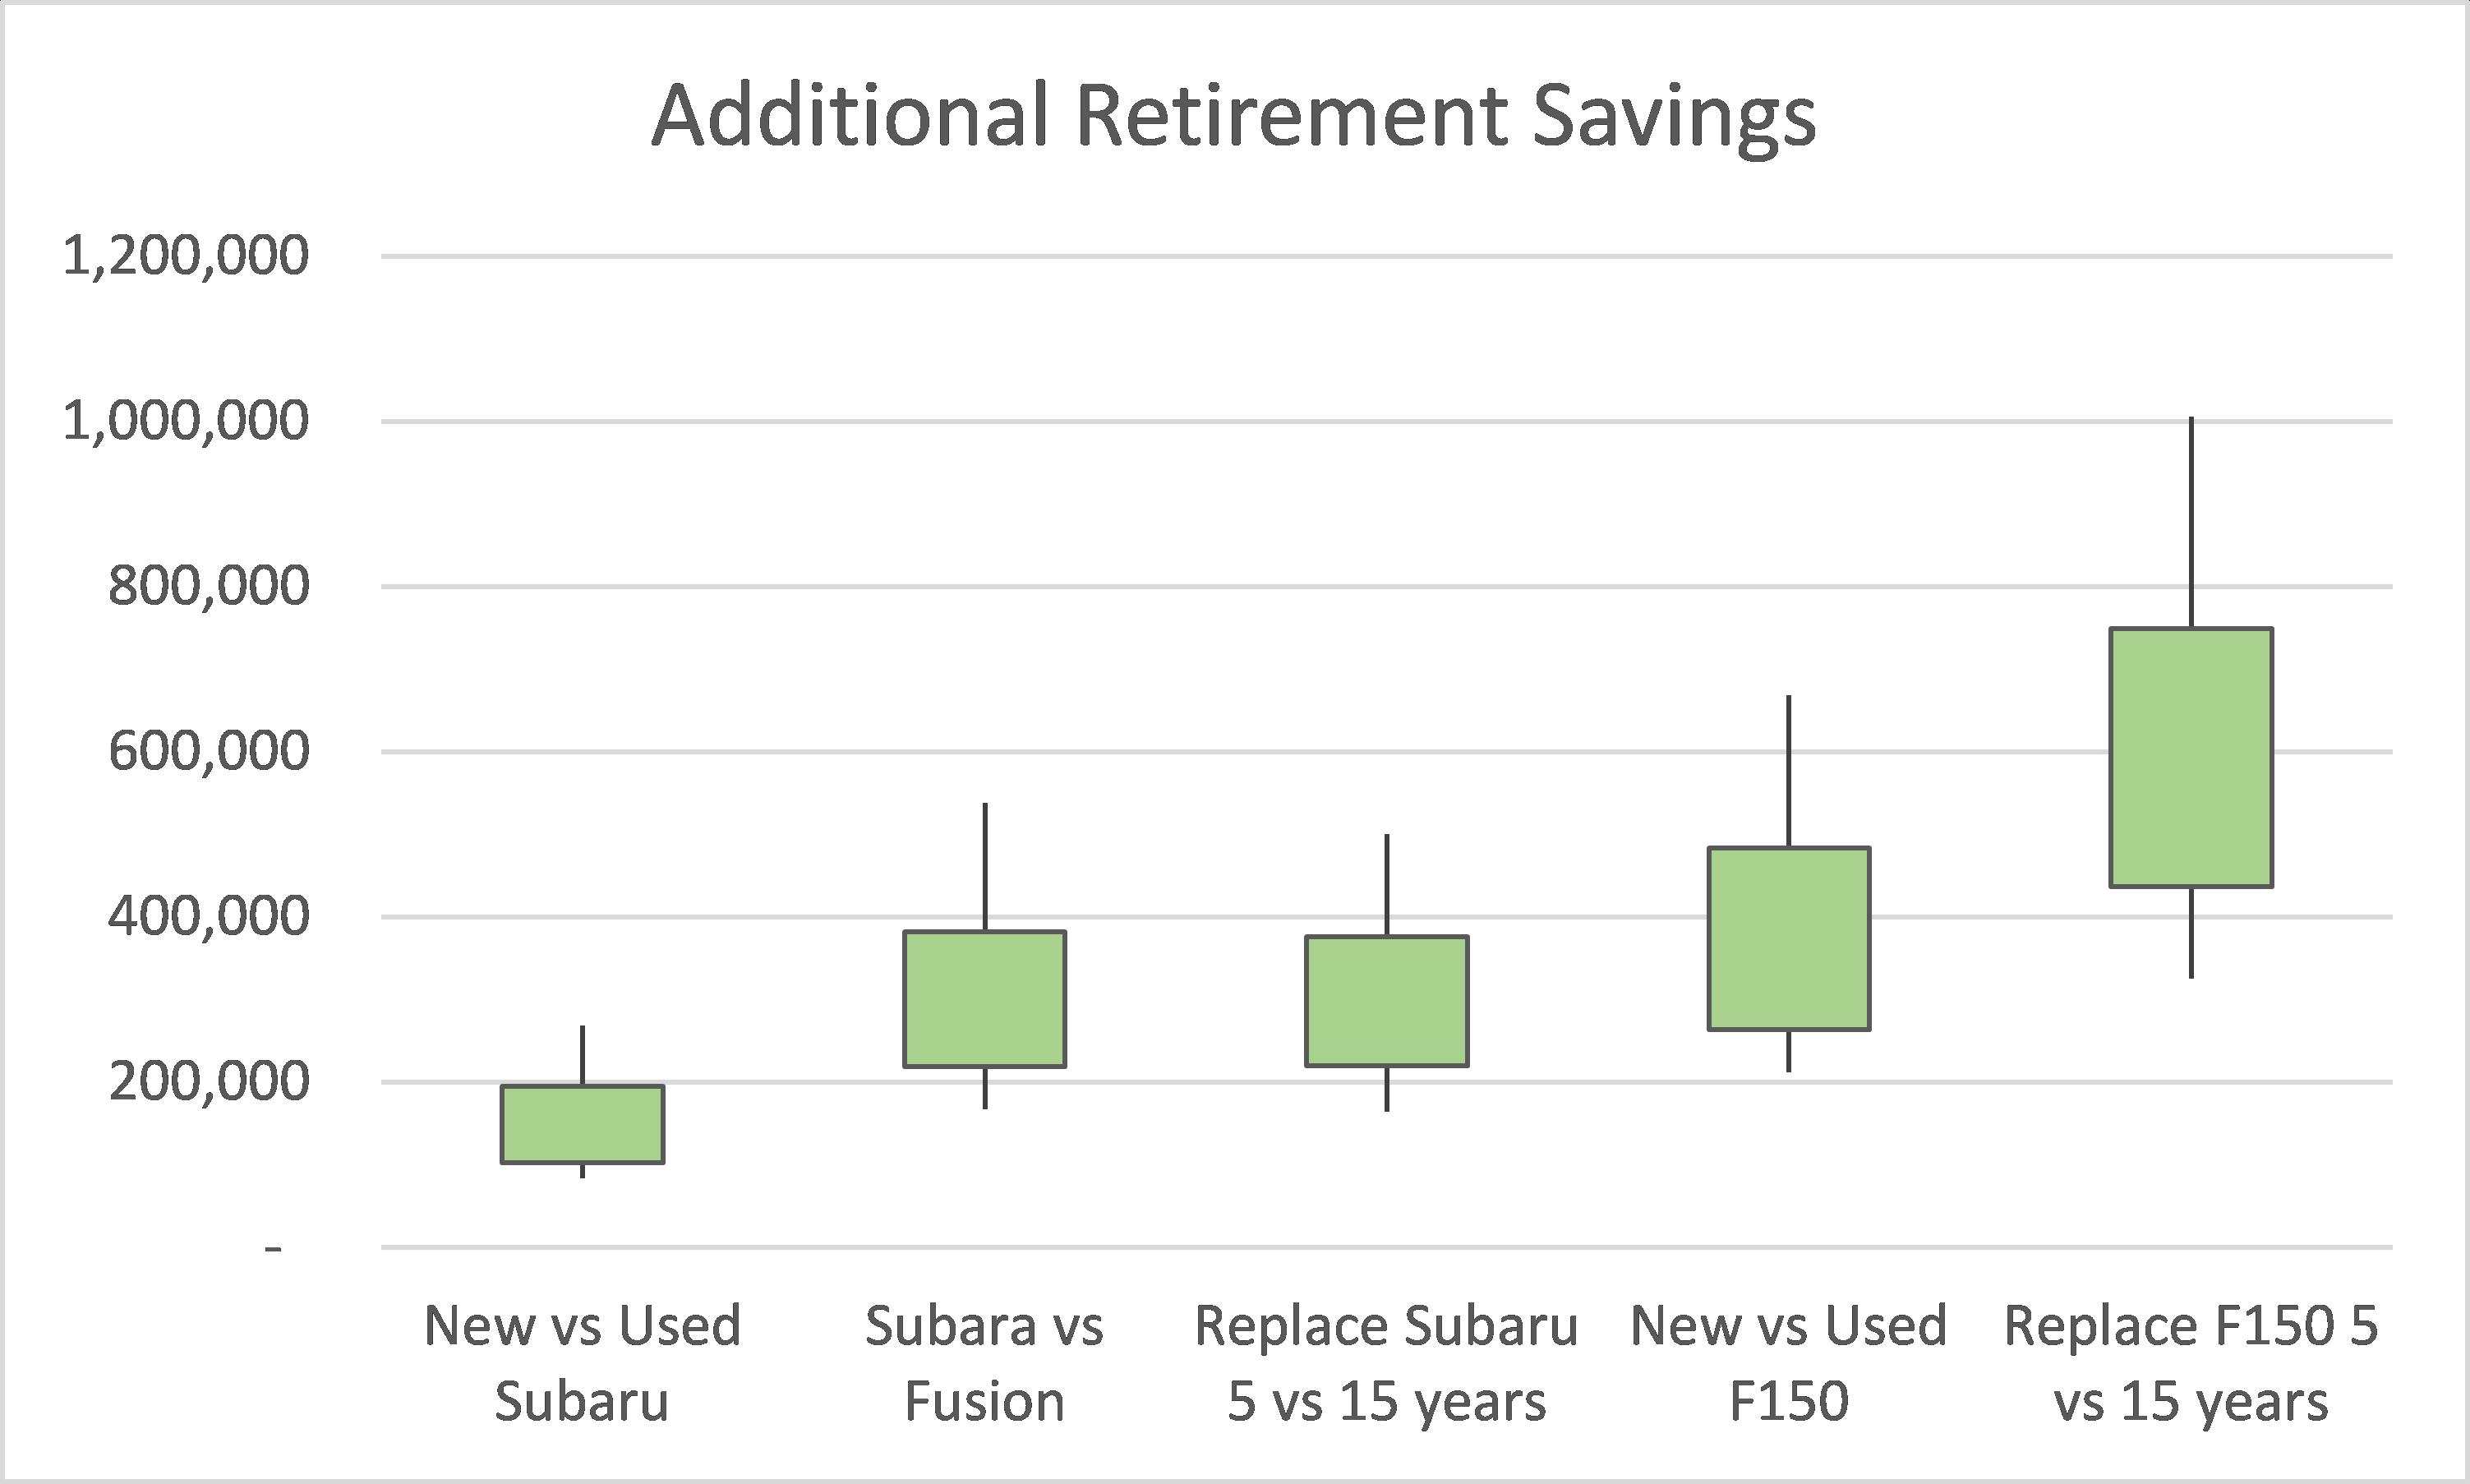 Additional Retirement Savings